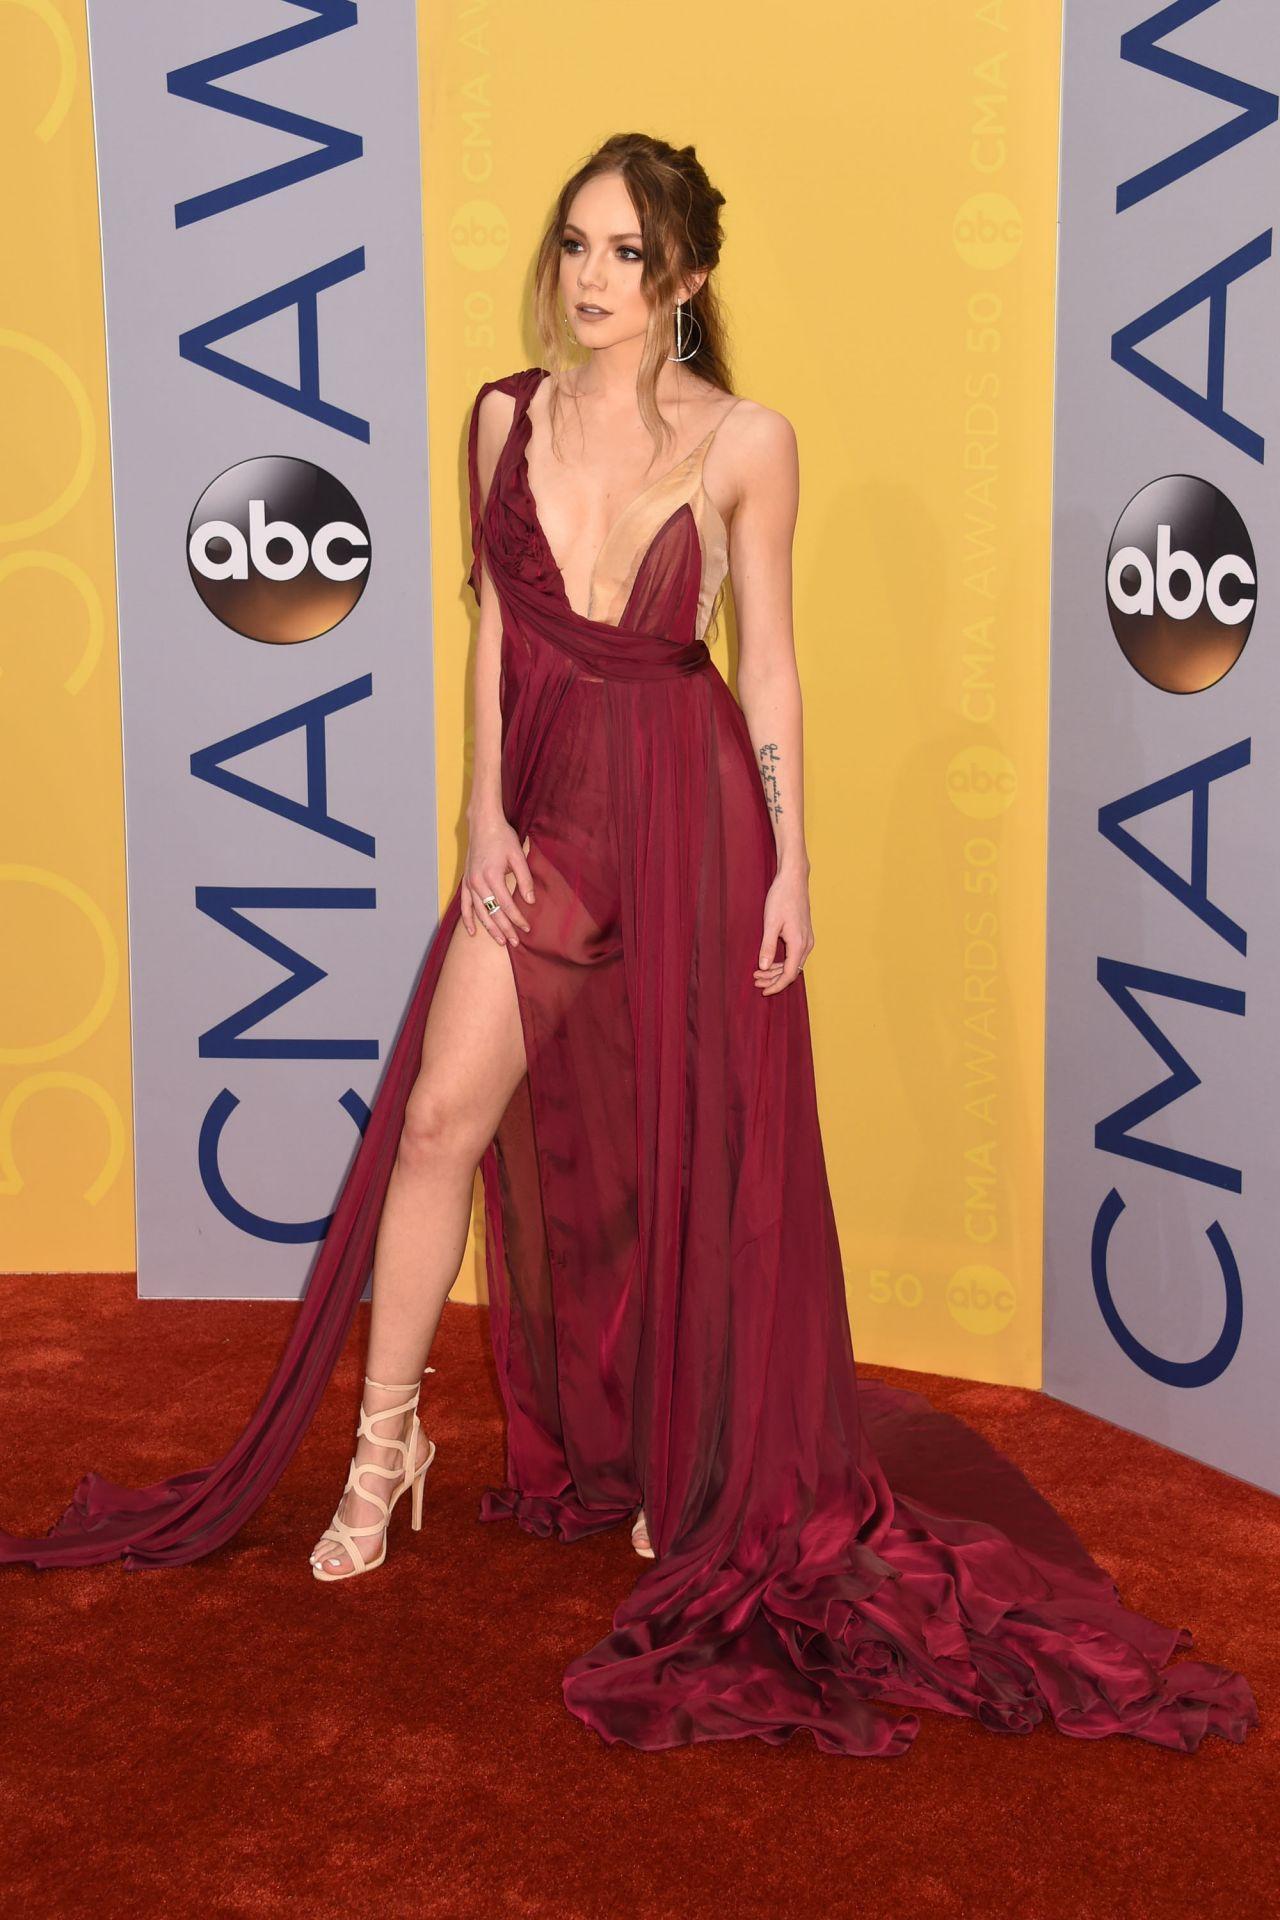 Danielle Bradbery Legs >> Danielle Bradbery – 50th Annual CMA Awards in Nashville 11/2/ 2016